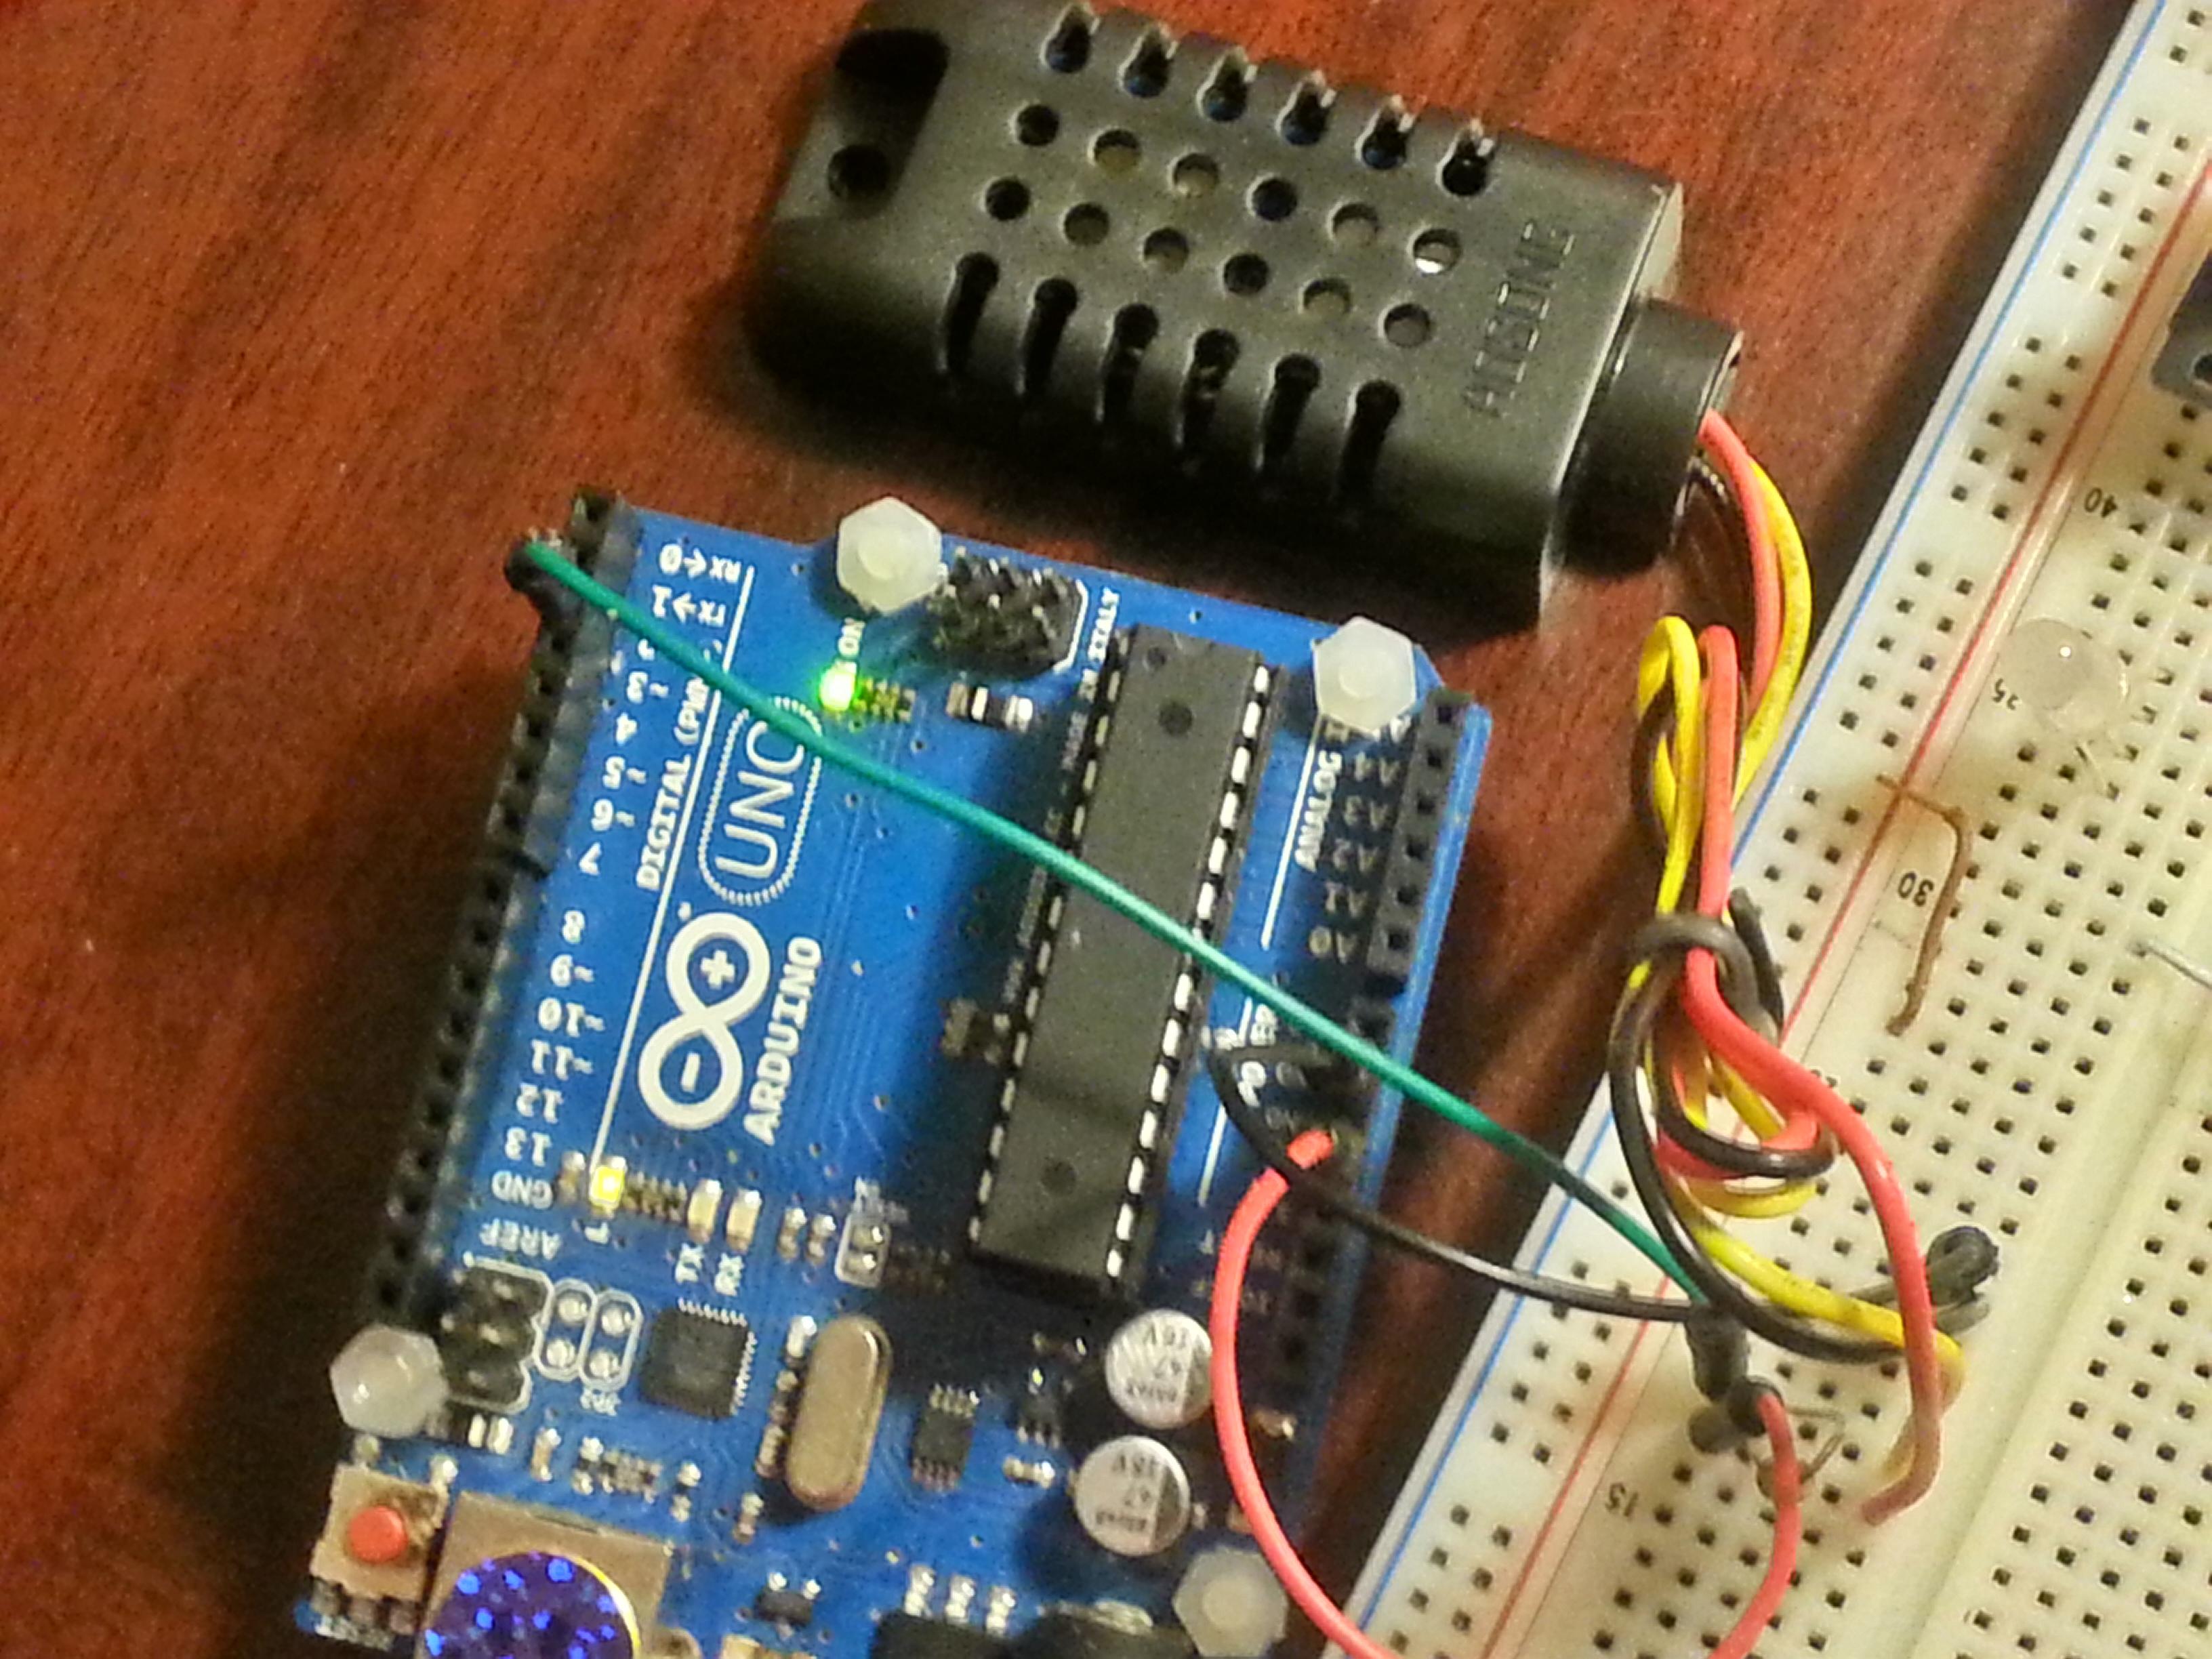 Dht21 Am2301 Digital Temperature Humidity Sensor Module